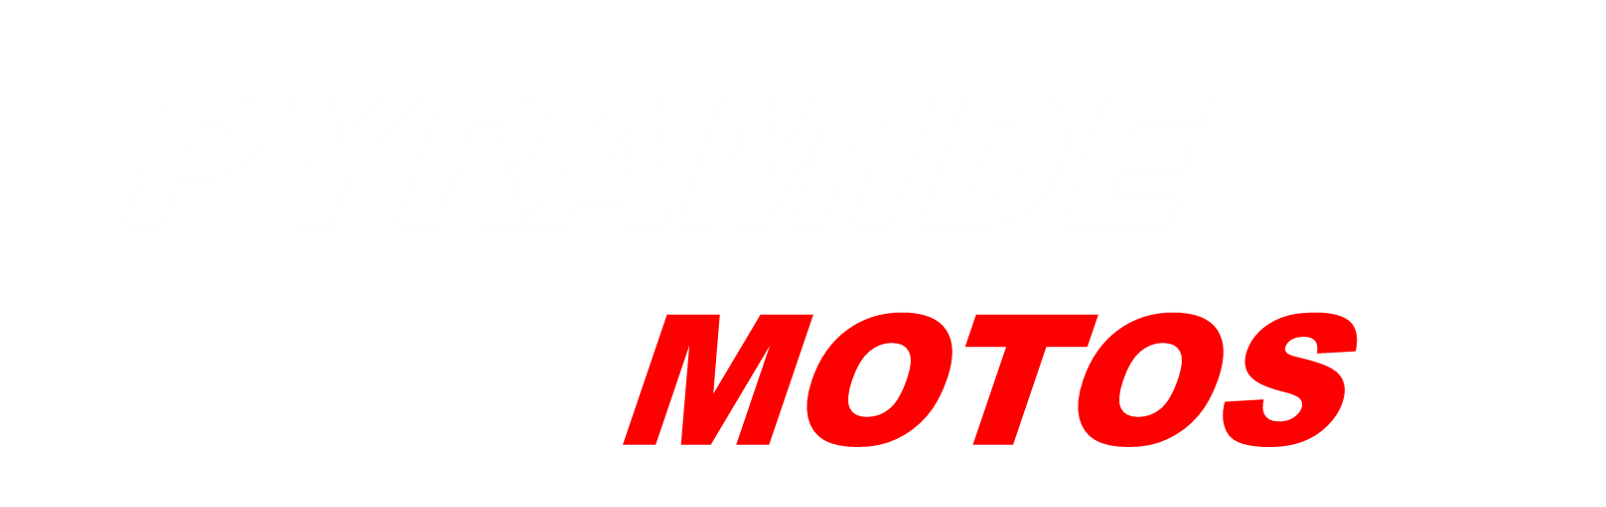 Pyramide motos